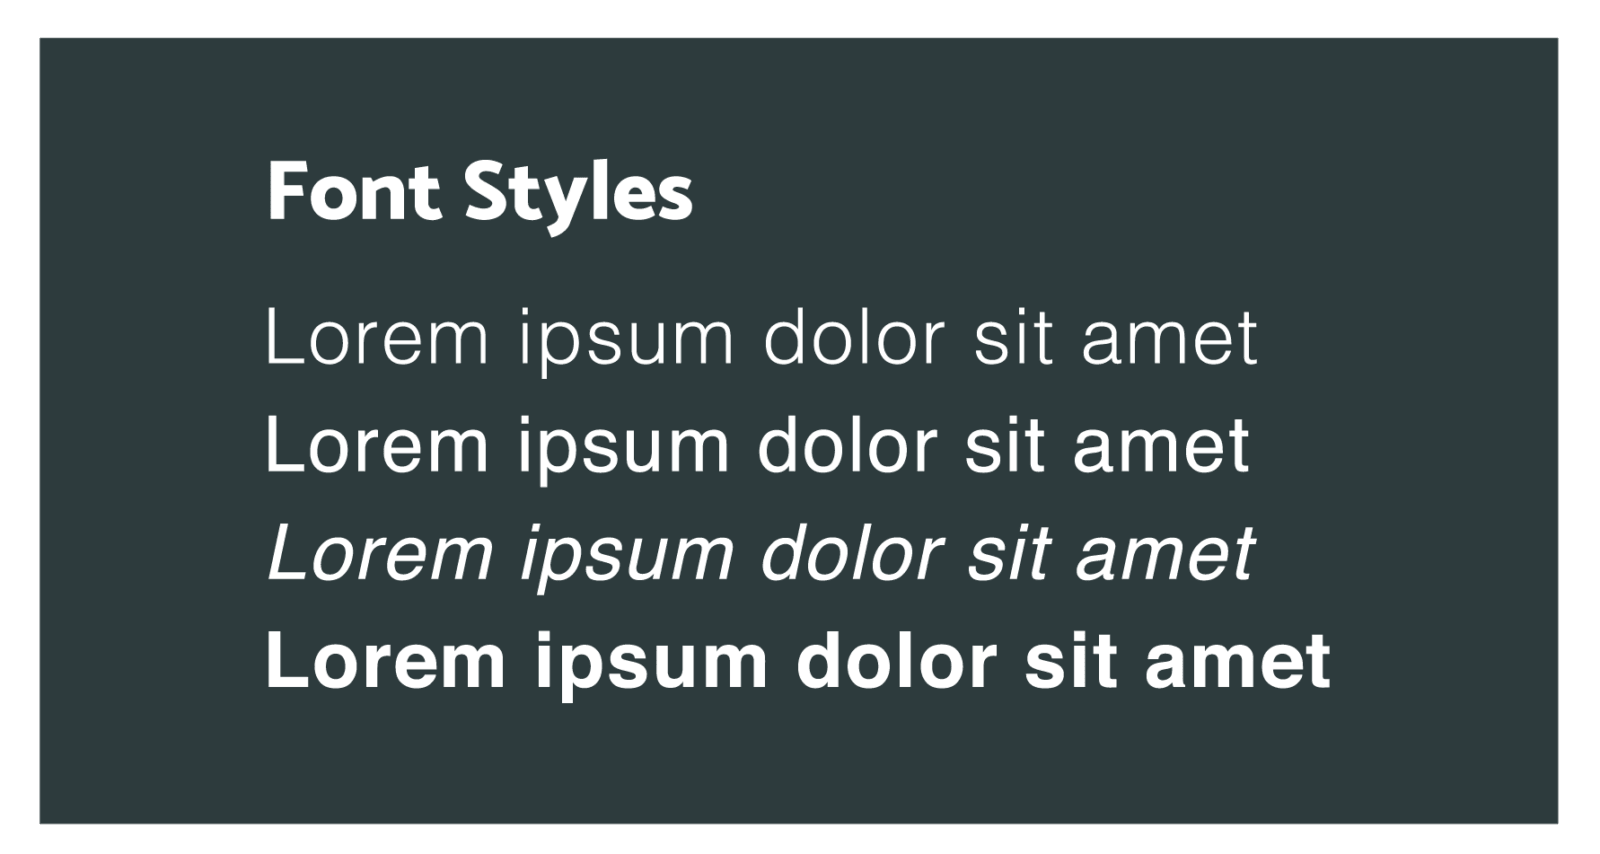 Font Styles - Digital Marketing Agency